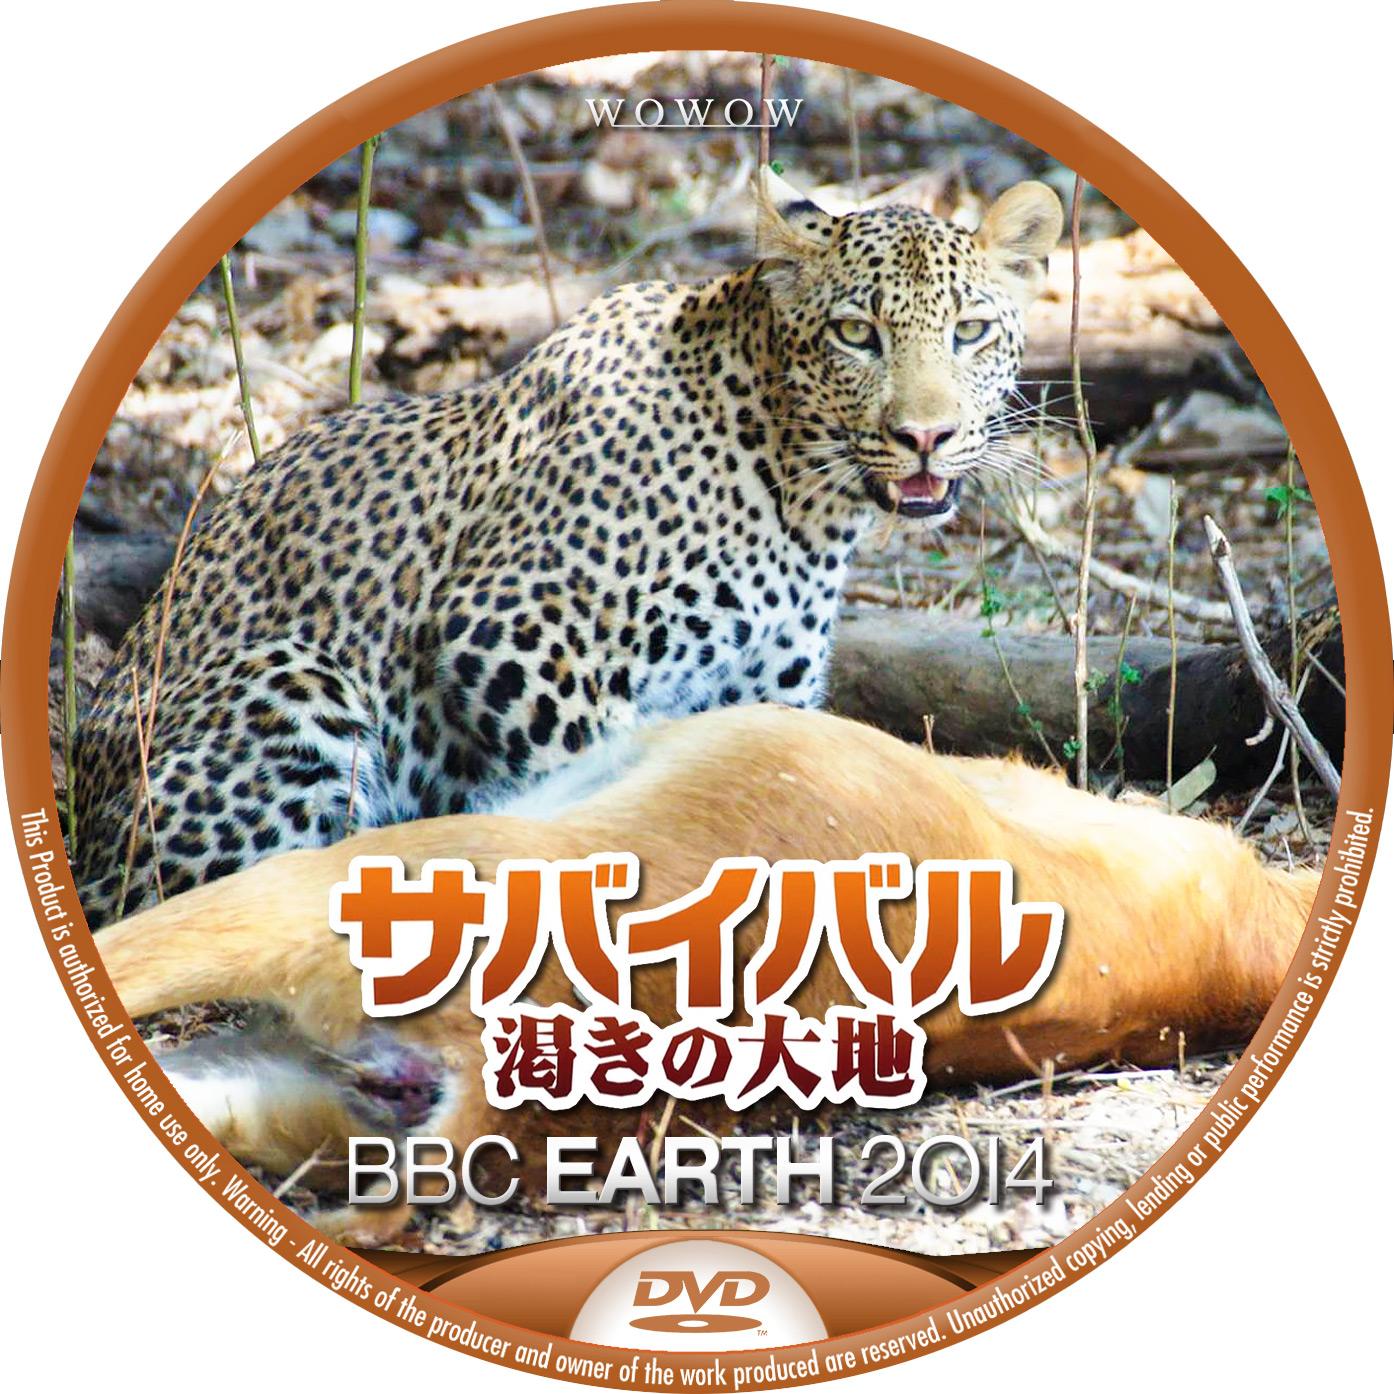 BBC EARTH 2014 サバイバル WOWOW DVDラベル